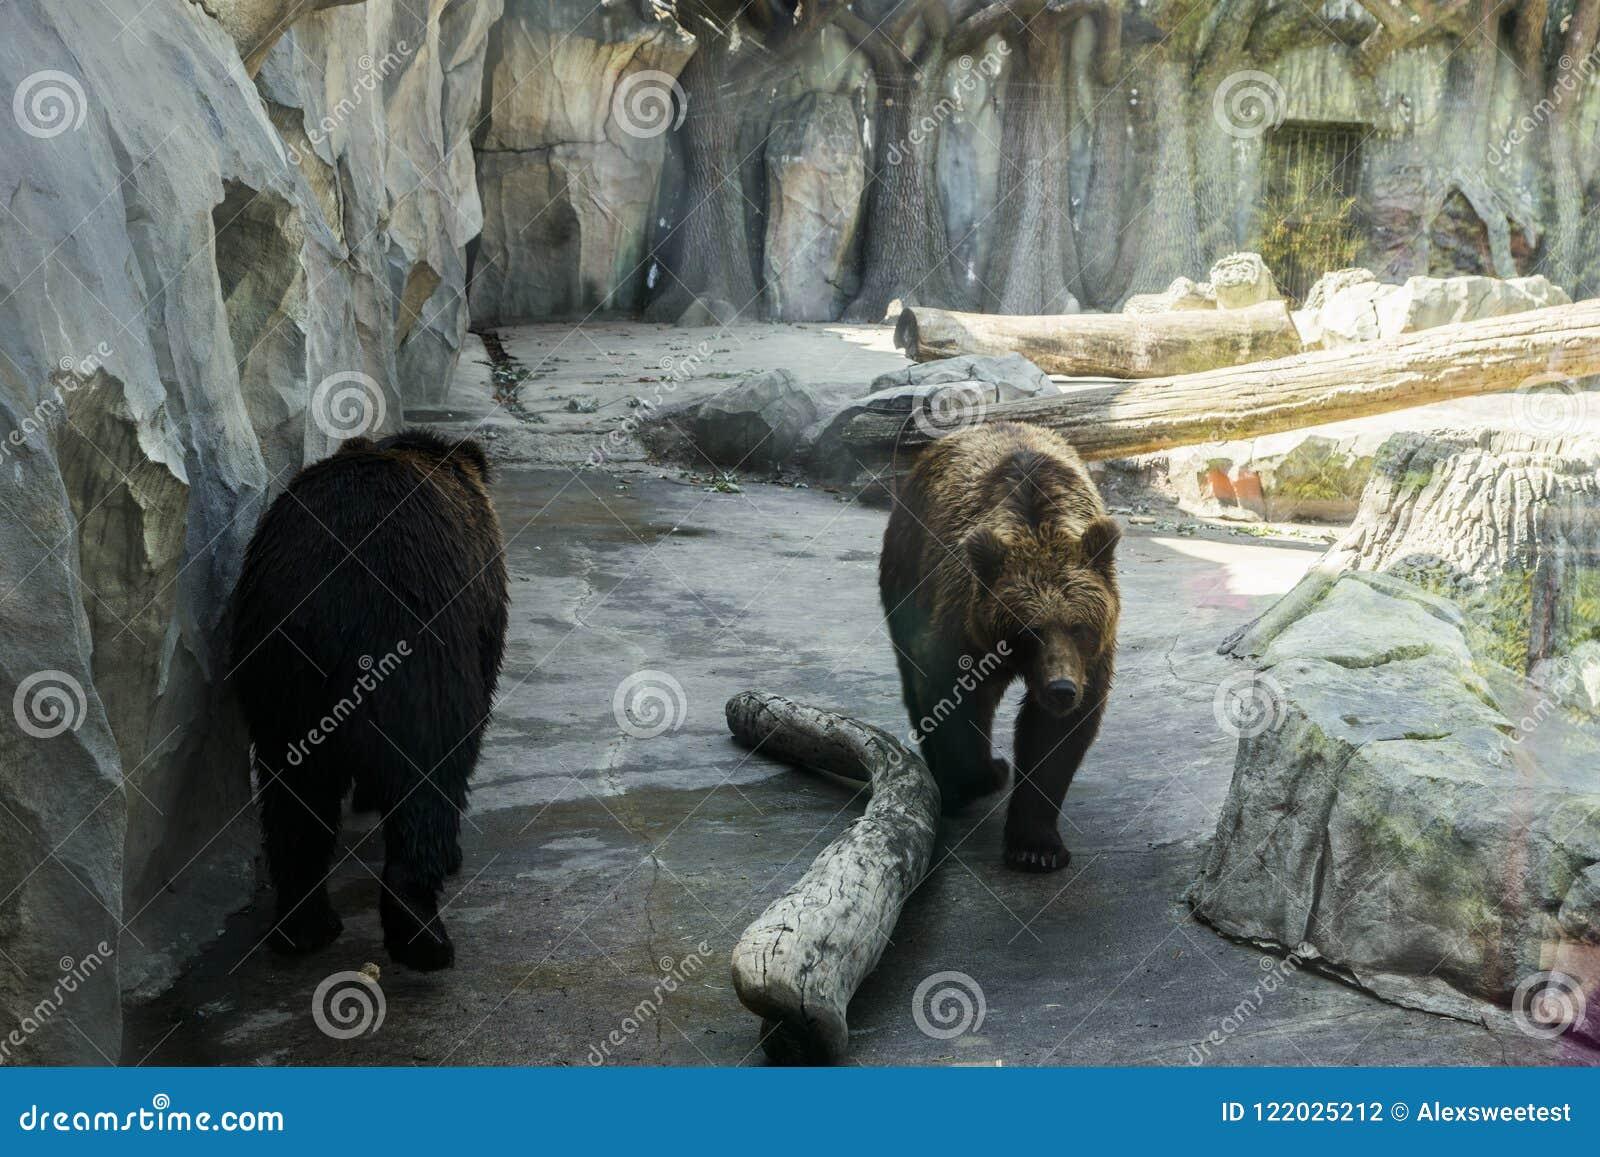 Roofdieren wit-chested beren